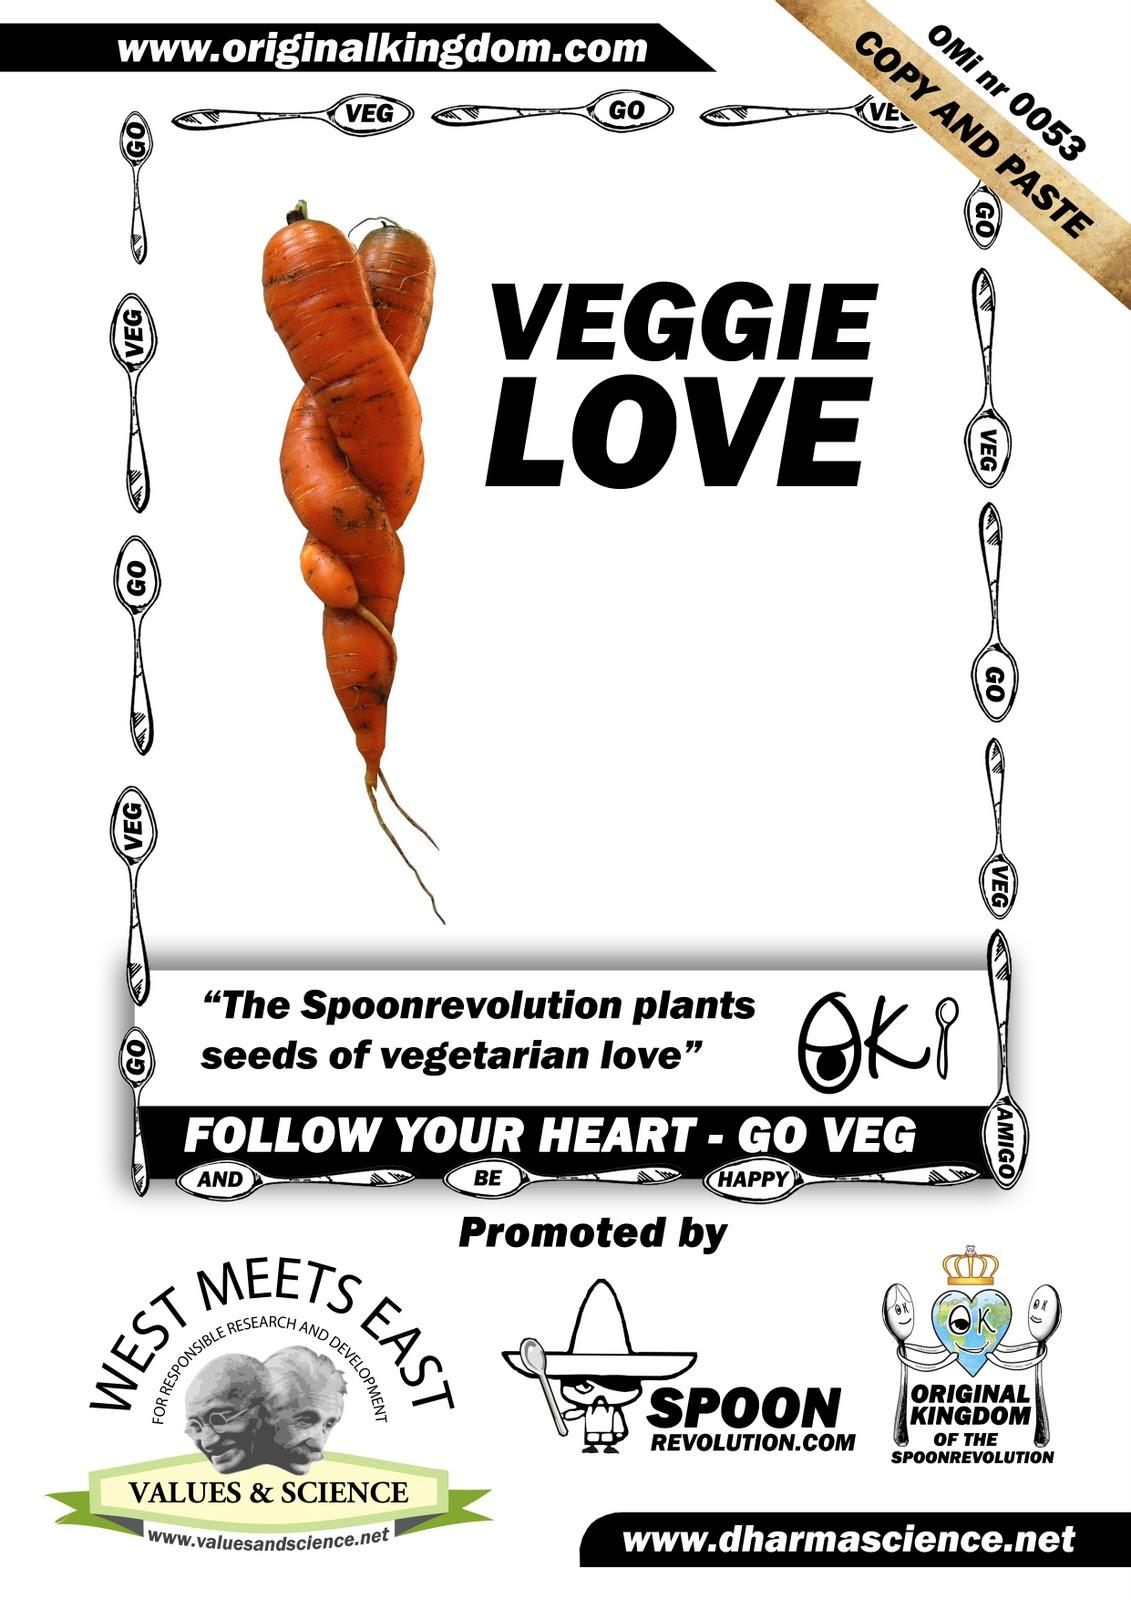 http://4.bp.blogspot.com/_bX3e17ul0WY/TOiG8raHUhI/AAAAAAAAC6M/_BNZcrtmWxM/s1600/0053_oki_veggie_love.jpg